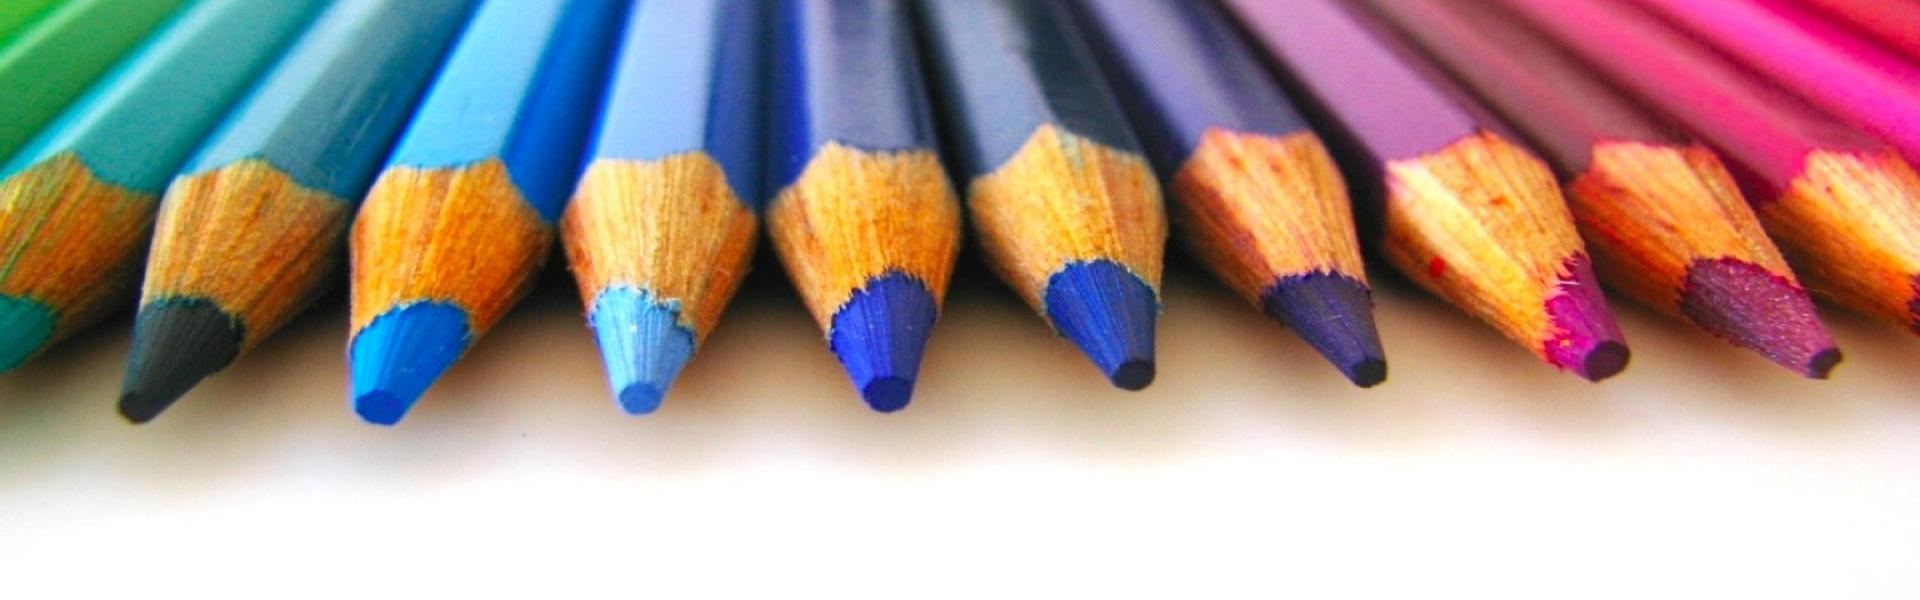 ecole-crayons.jpg